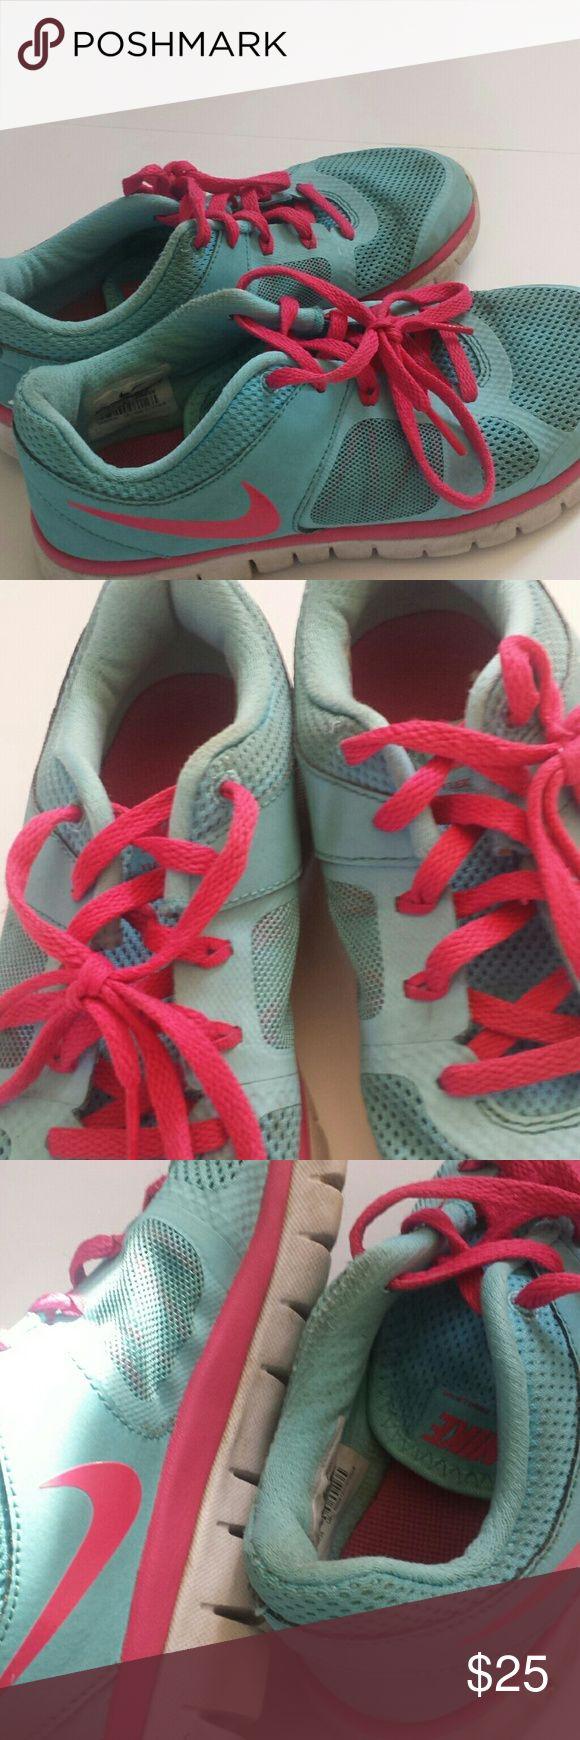 Tiffany blue nike flex run Size youth 4.5 = women's 6.5 worn but still has life Nike Shoes Sneakers